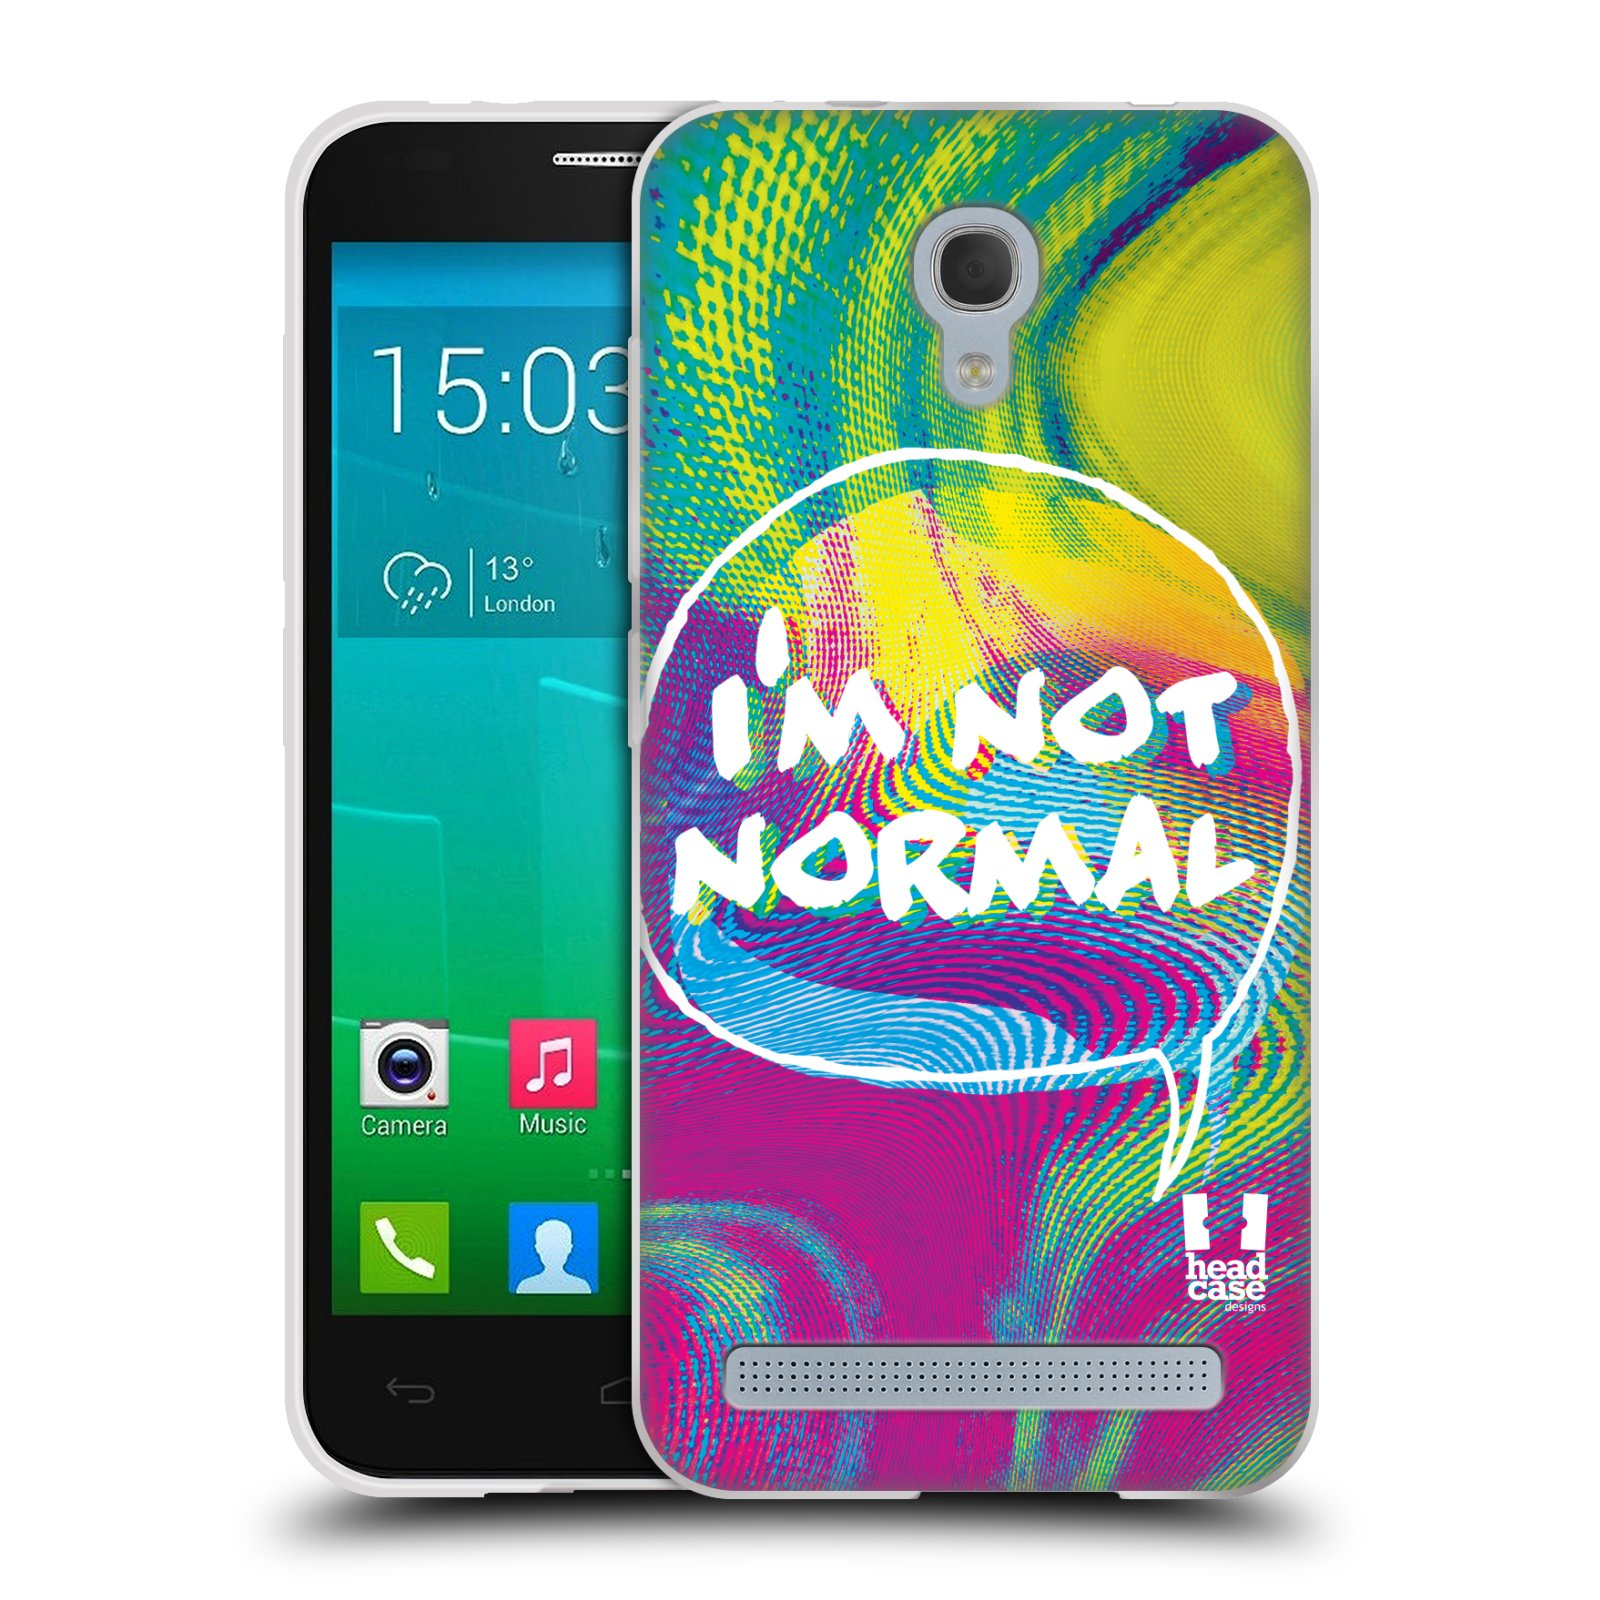 Silikonové pouzdro na mobil Alcatel One Touch Idol 2 Mini S 6036Y HEAD CASE HOLOGRAF I'M NOT NORMAL (Silikonový kryt či obal na mobilní telefon Alcatel Idol 2 Mini S OT-6036Y)